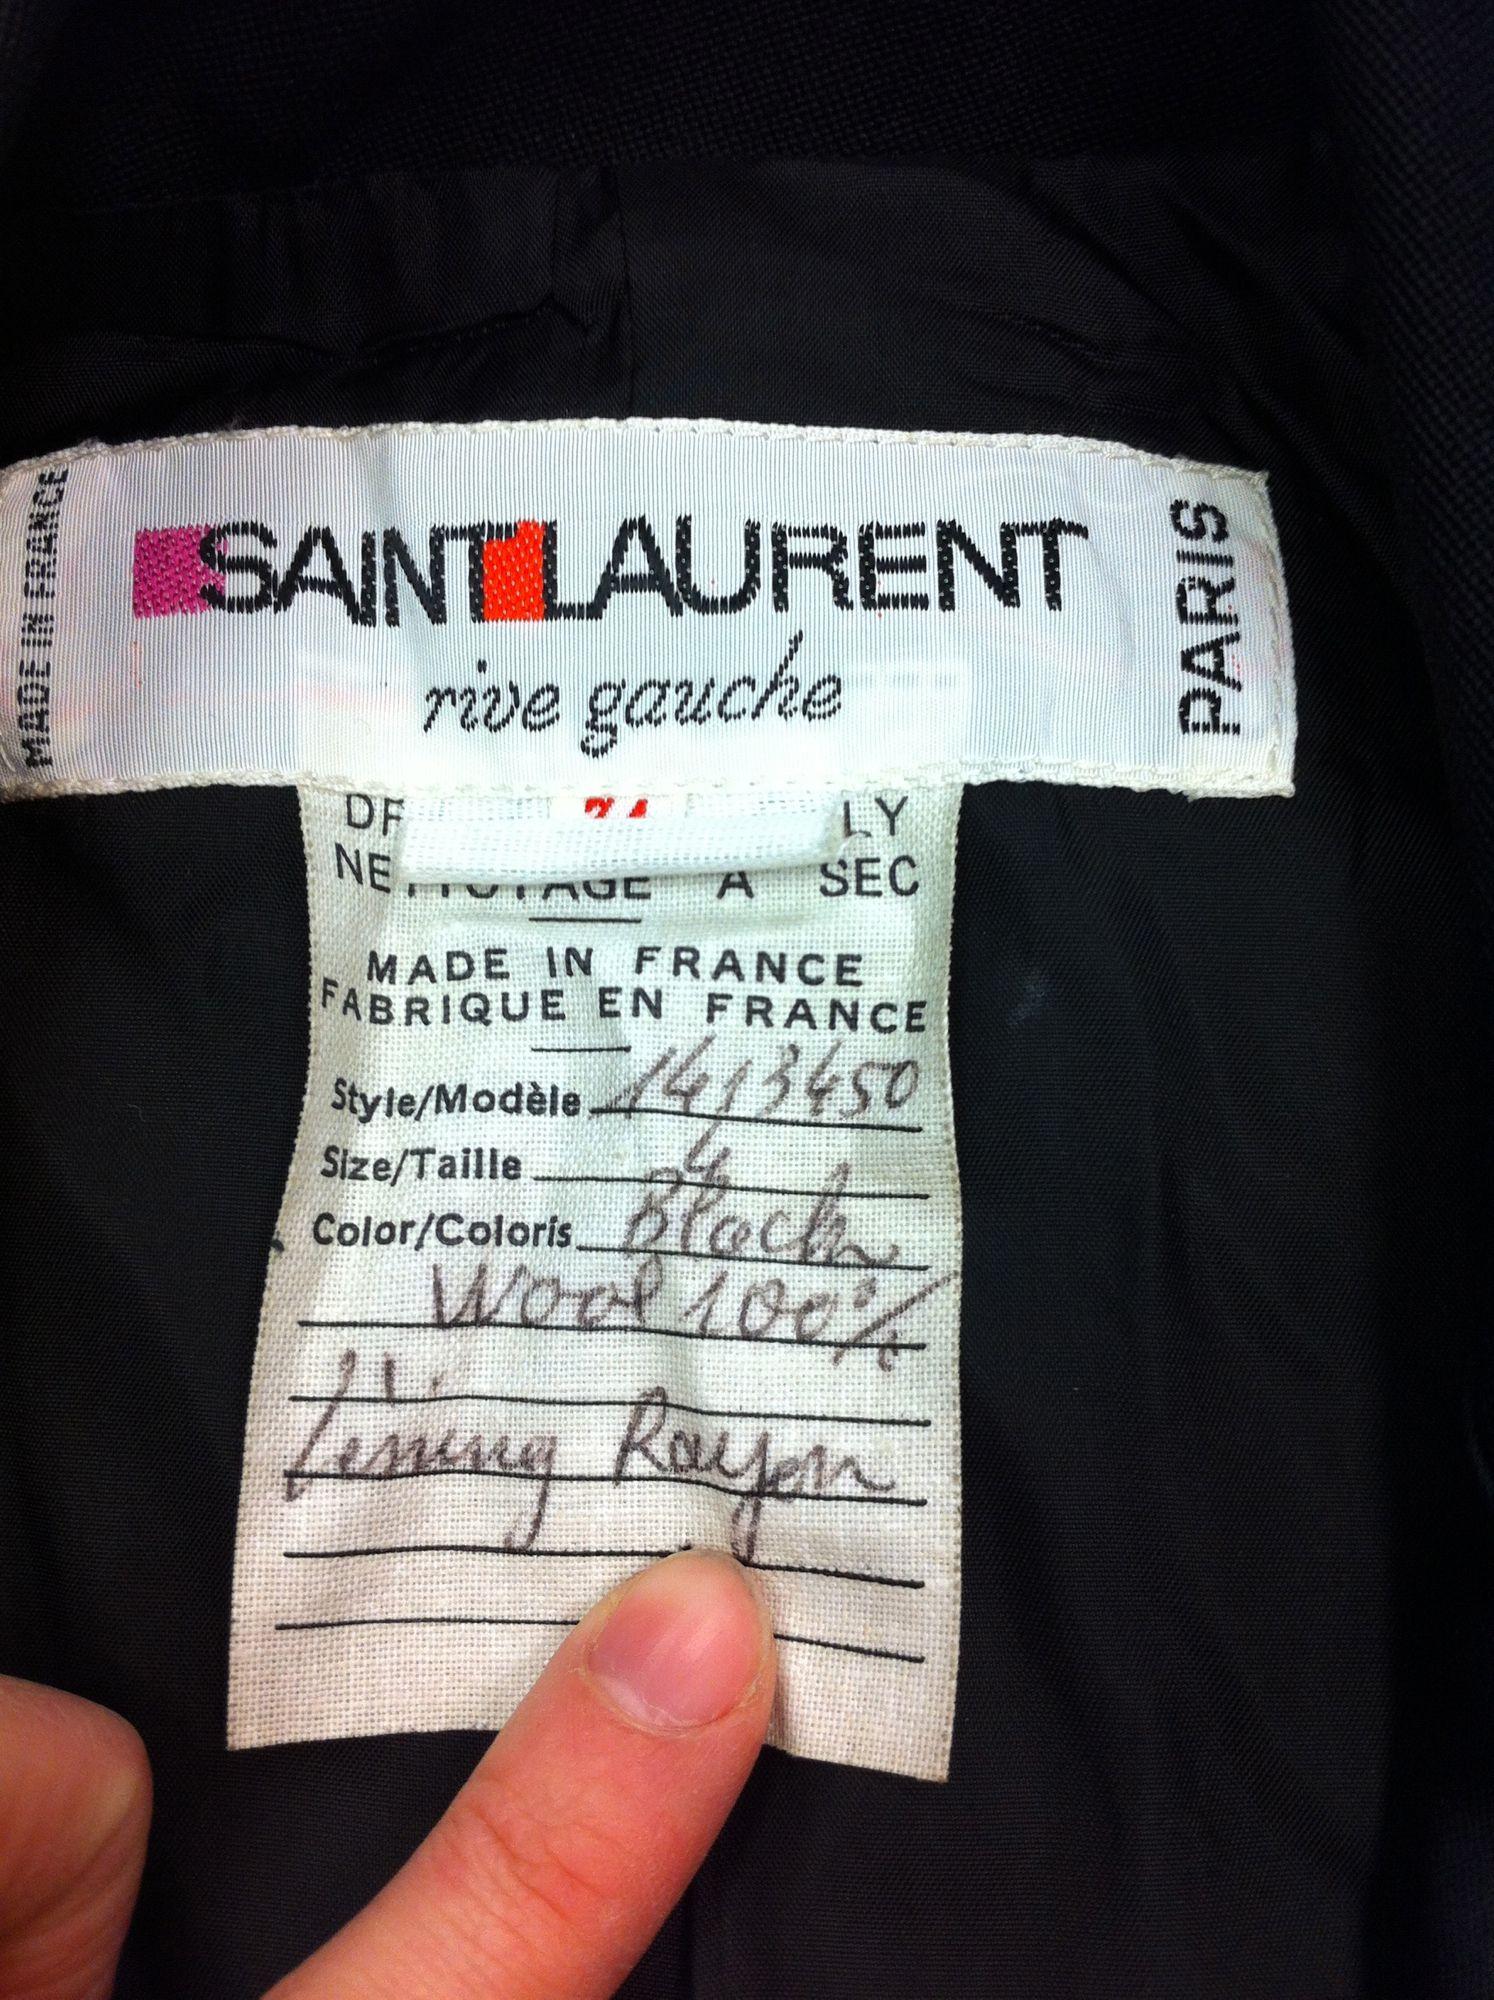 b4317618bca Vintage Yves Saint Laurent Rive Gauche label in a Kimono style tux jacket.  Sold at Malena's Vintage Boutique